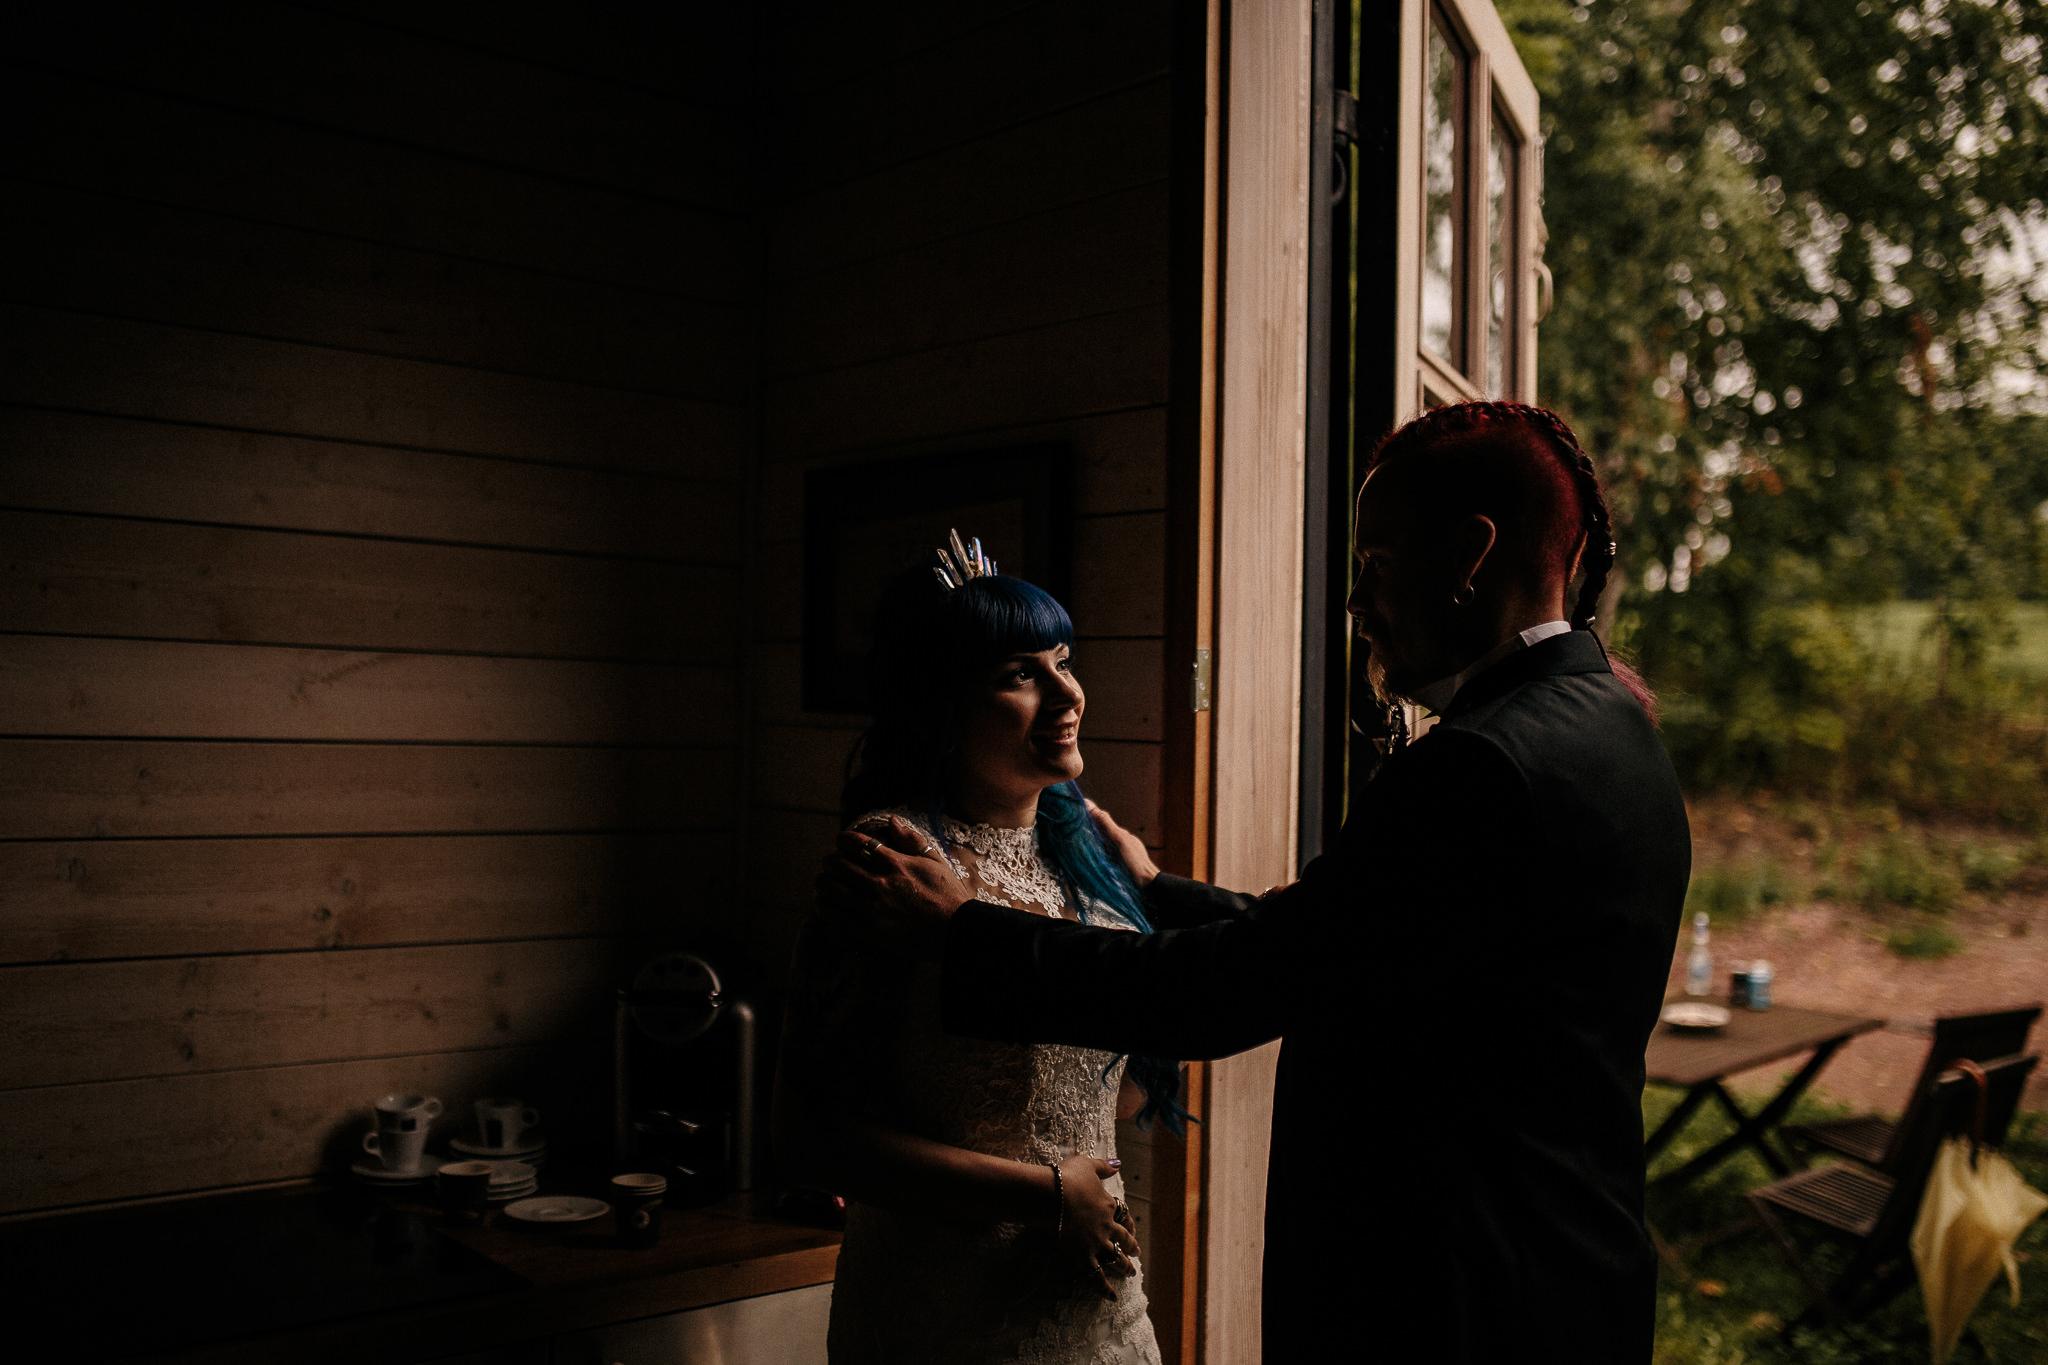 Ceren & Jani - Finland Wedding Photographer - Weddings by Qay - Wedding Photographer (73 of 166).jpg